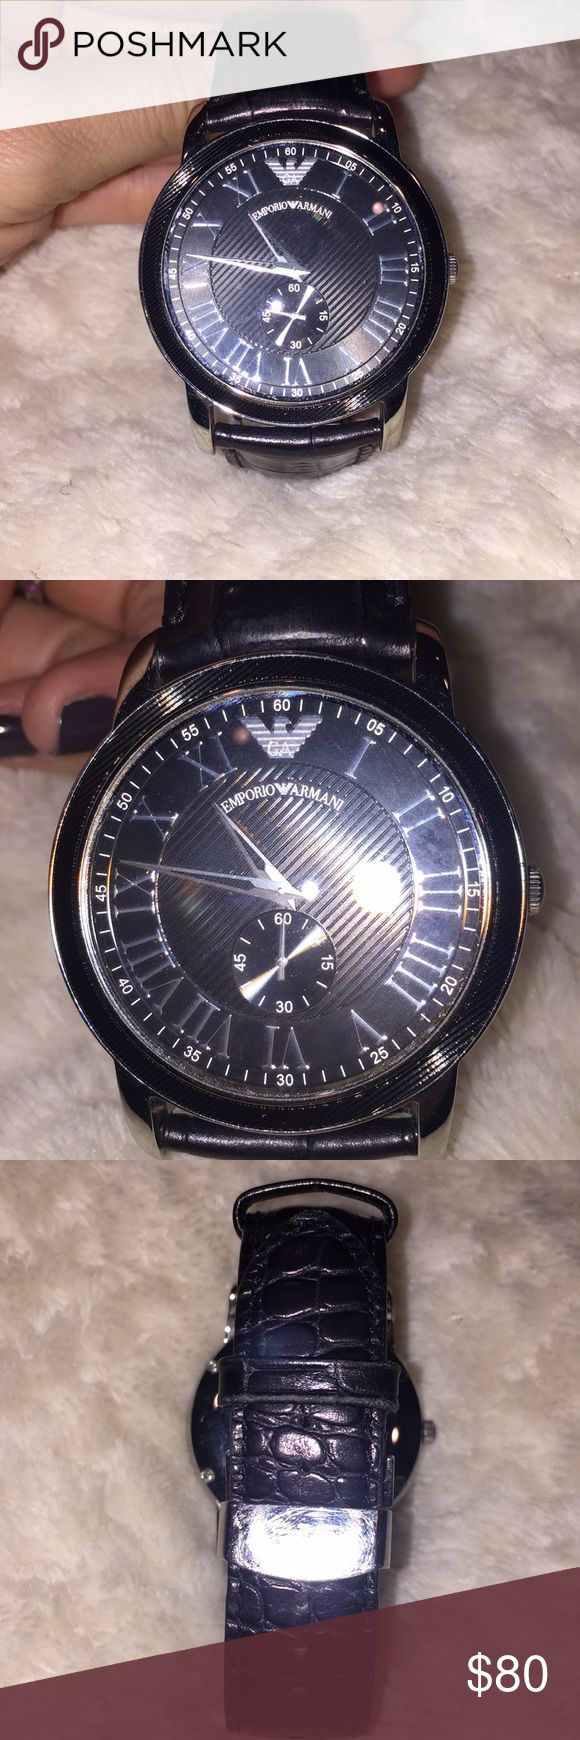 Emporia Armani men's watch Emporia Armani men's watch in great condition. Black band with black watch face Emporio Armani Accessories Watches